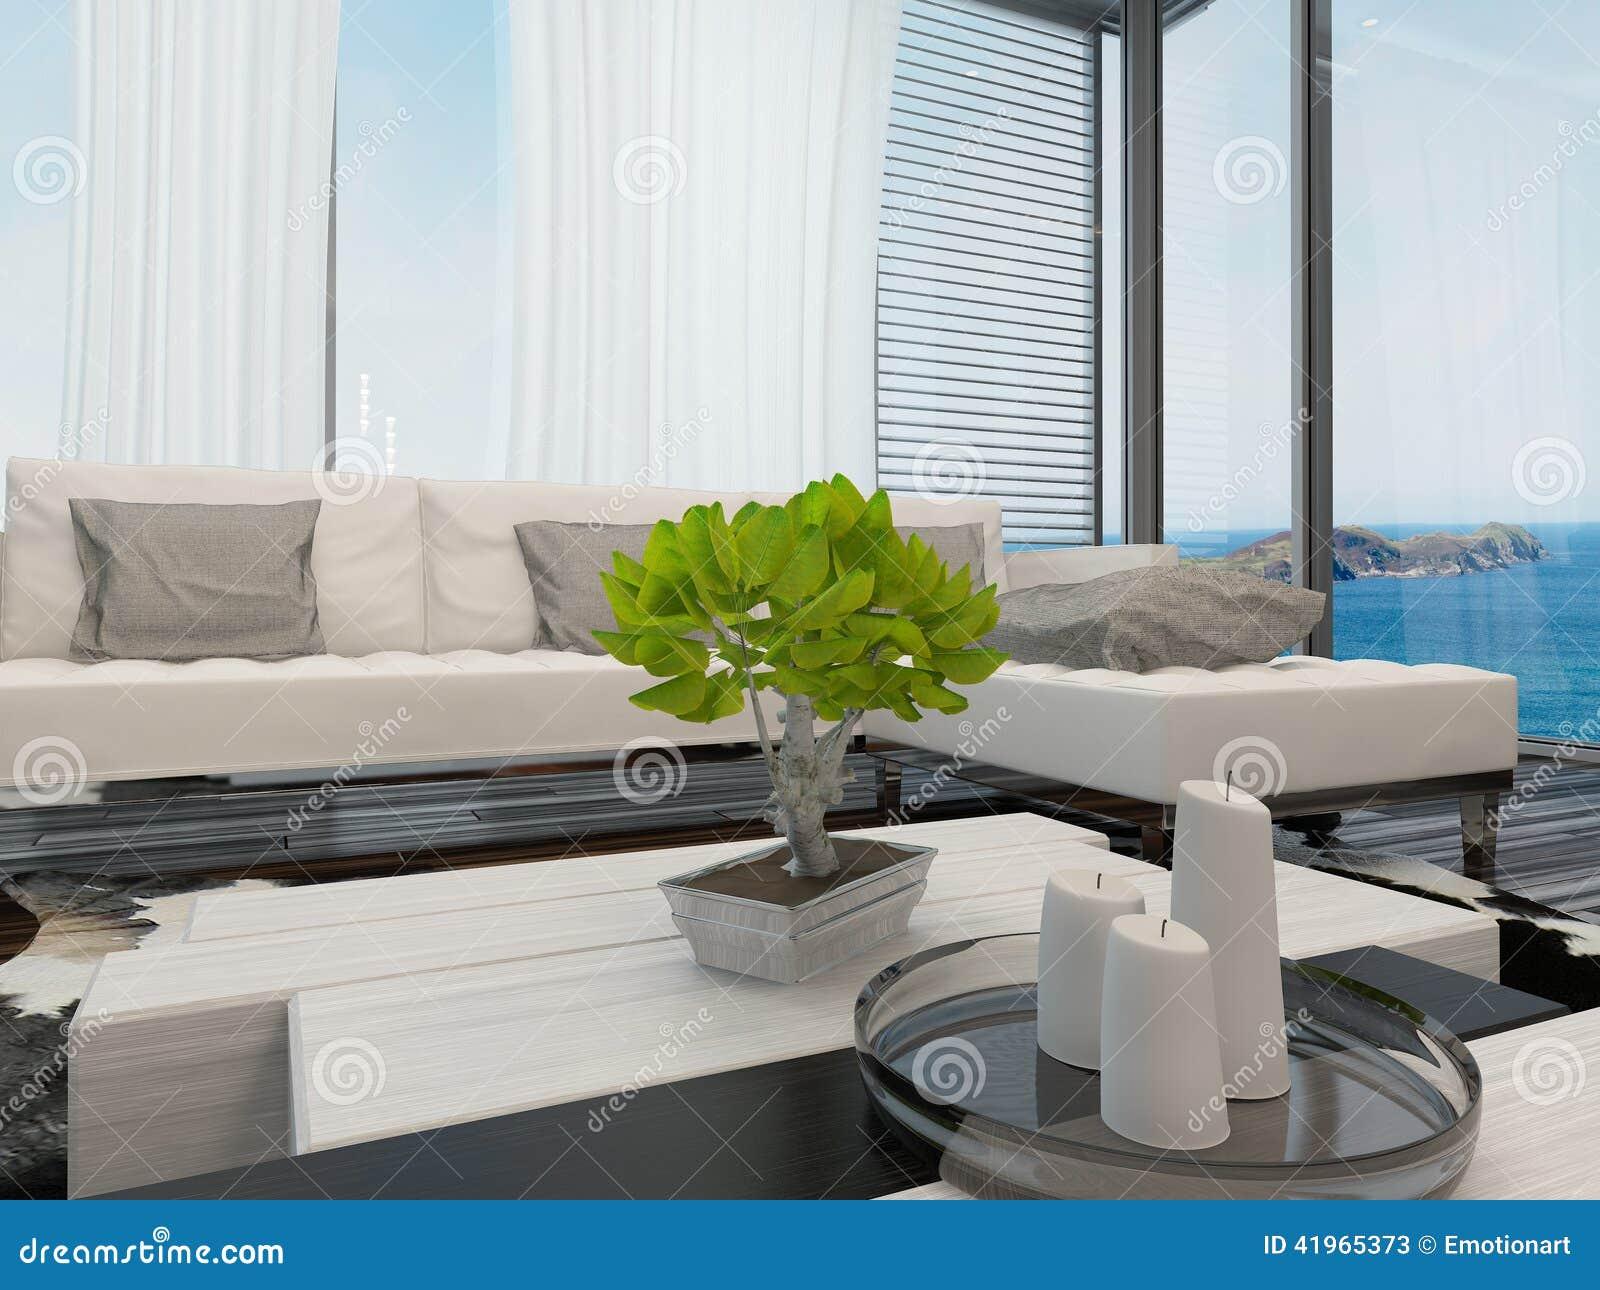 modern lounge interior with large windows stock illustration  - modern lounge interior overlooking the sea stock photos